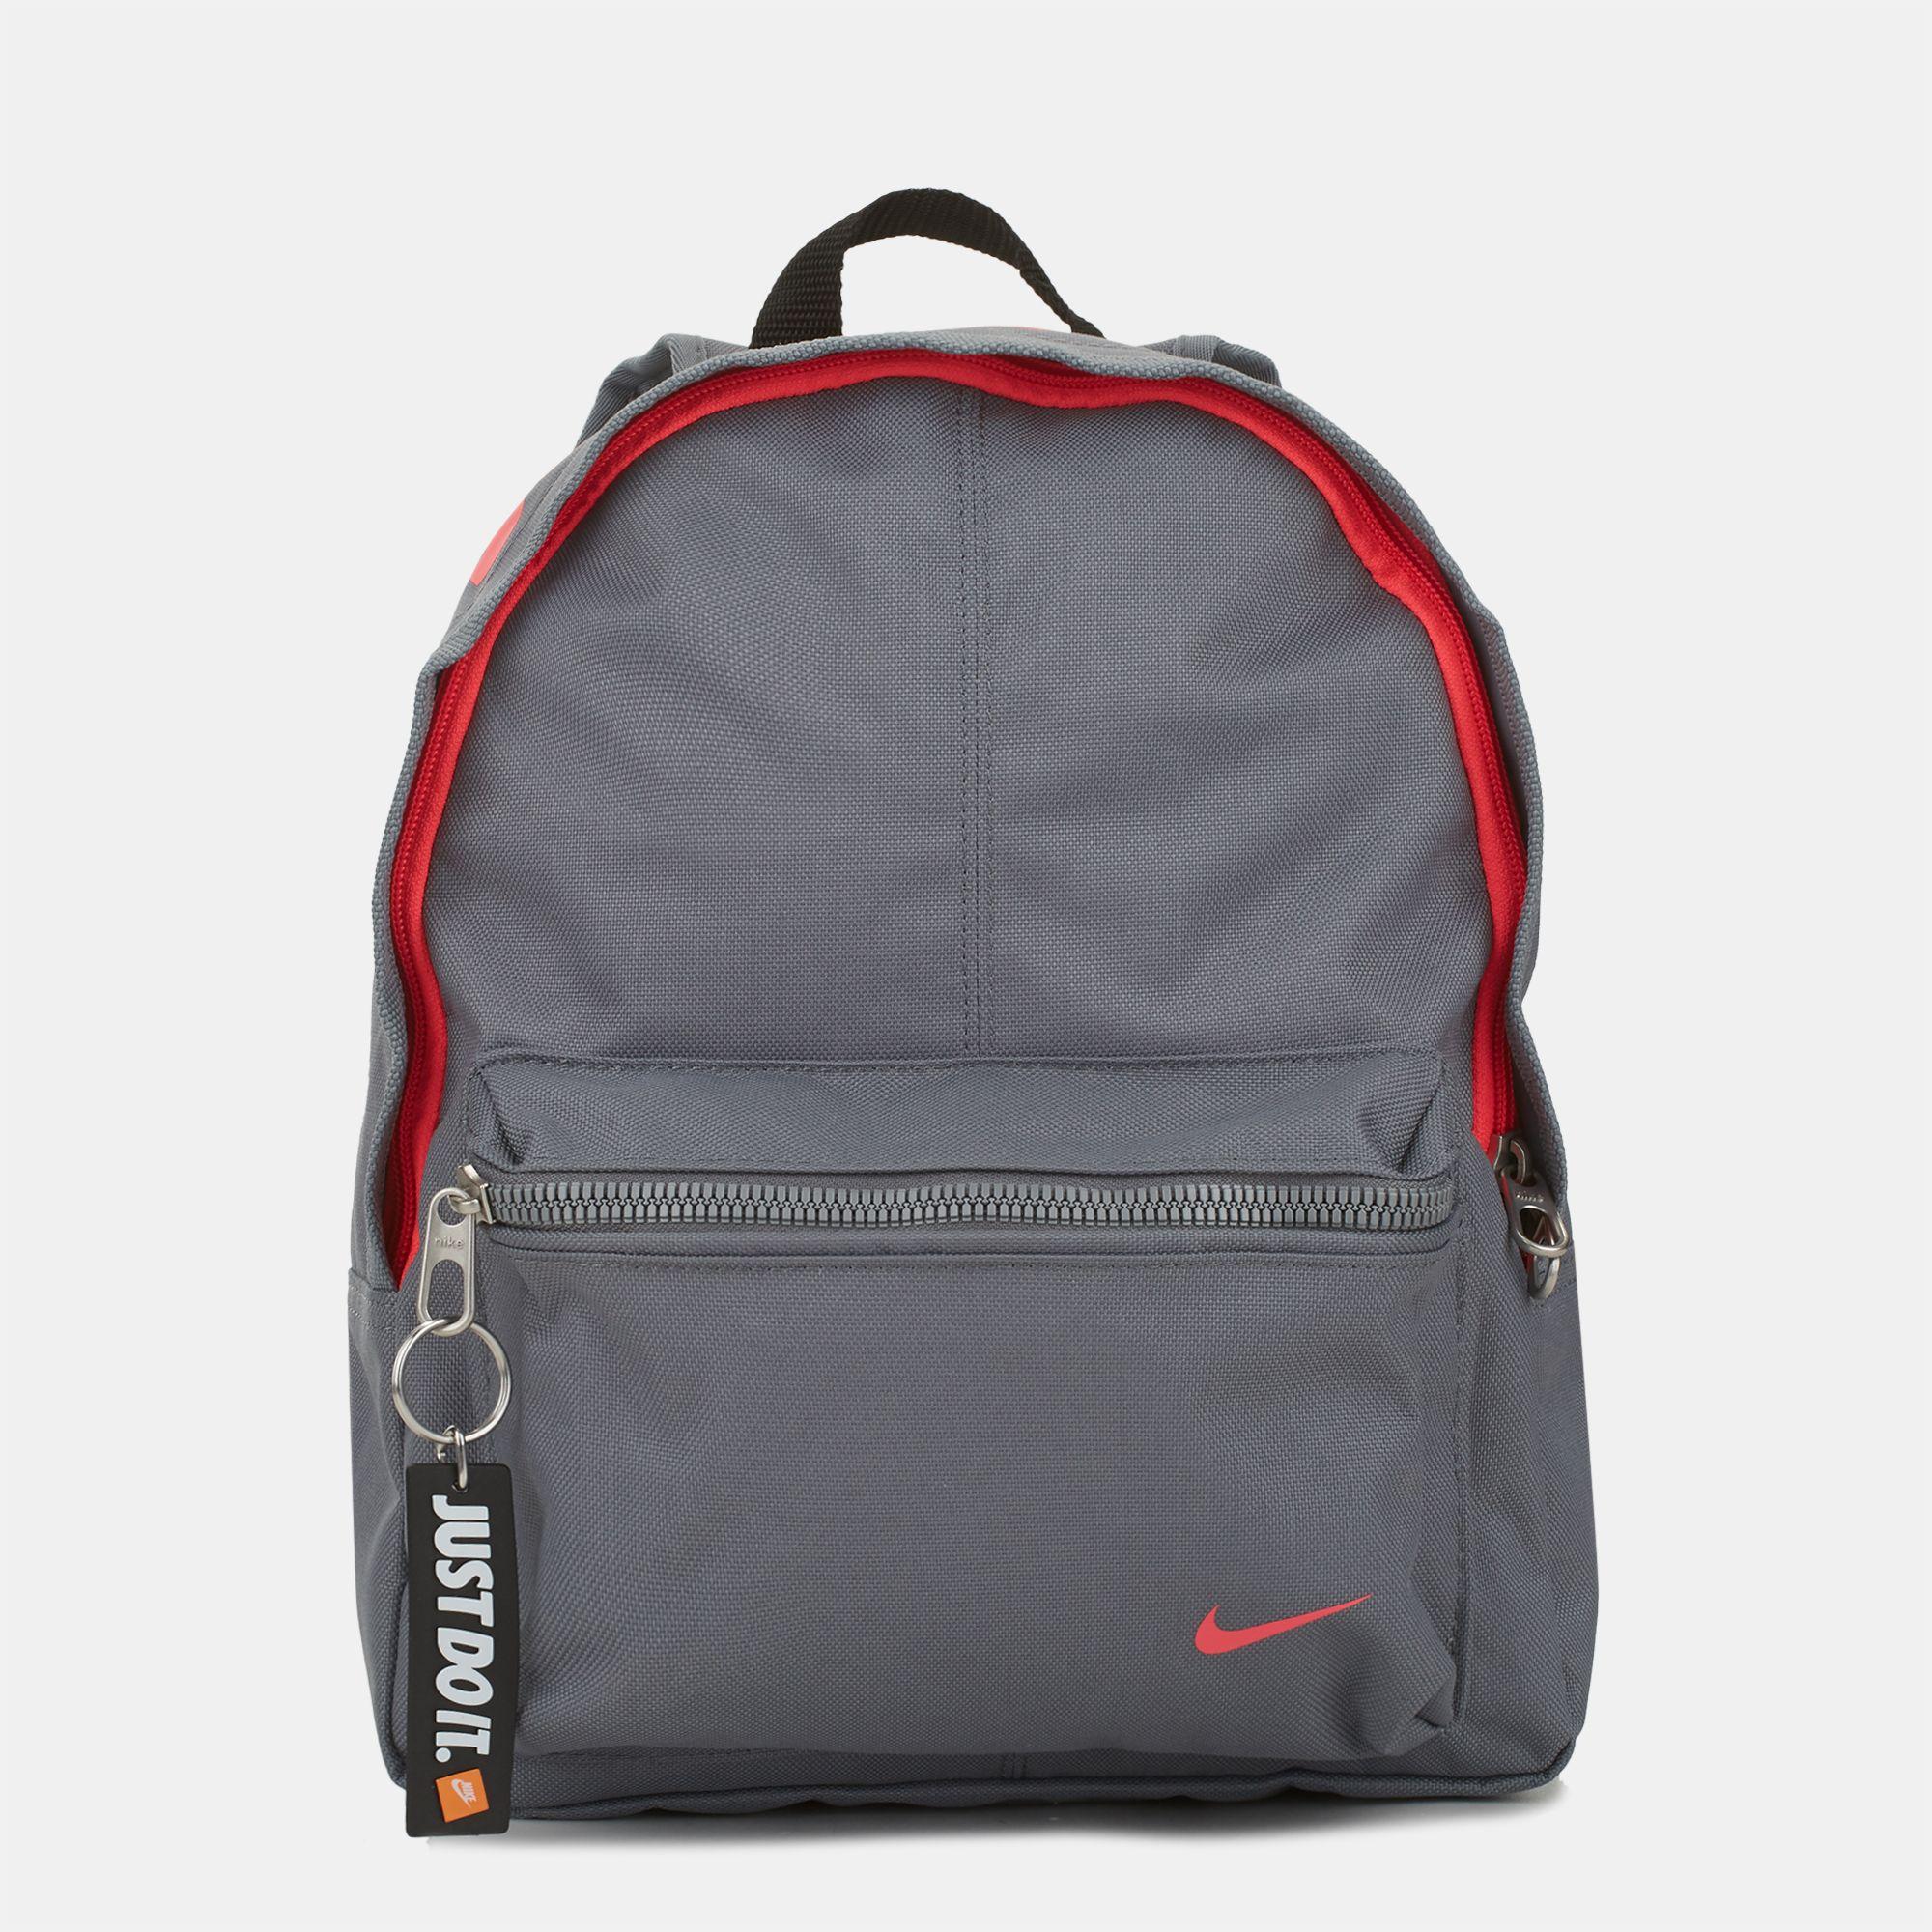 366e494d3e62 Nike Kids  Classic Backpack